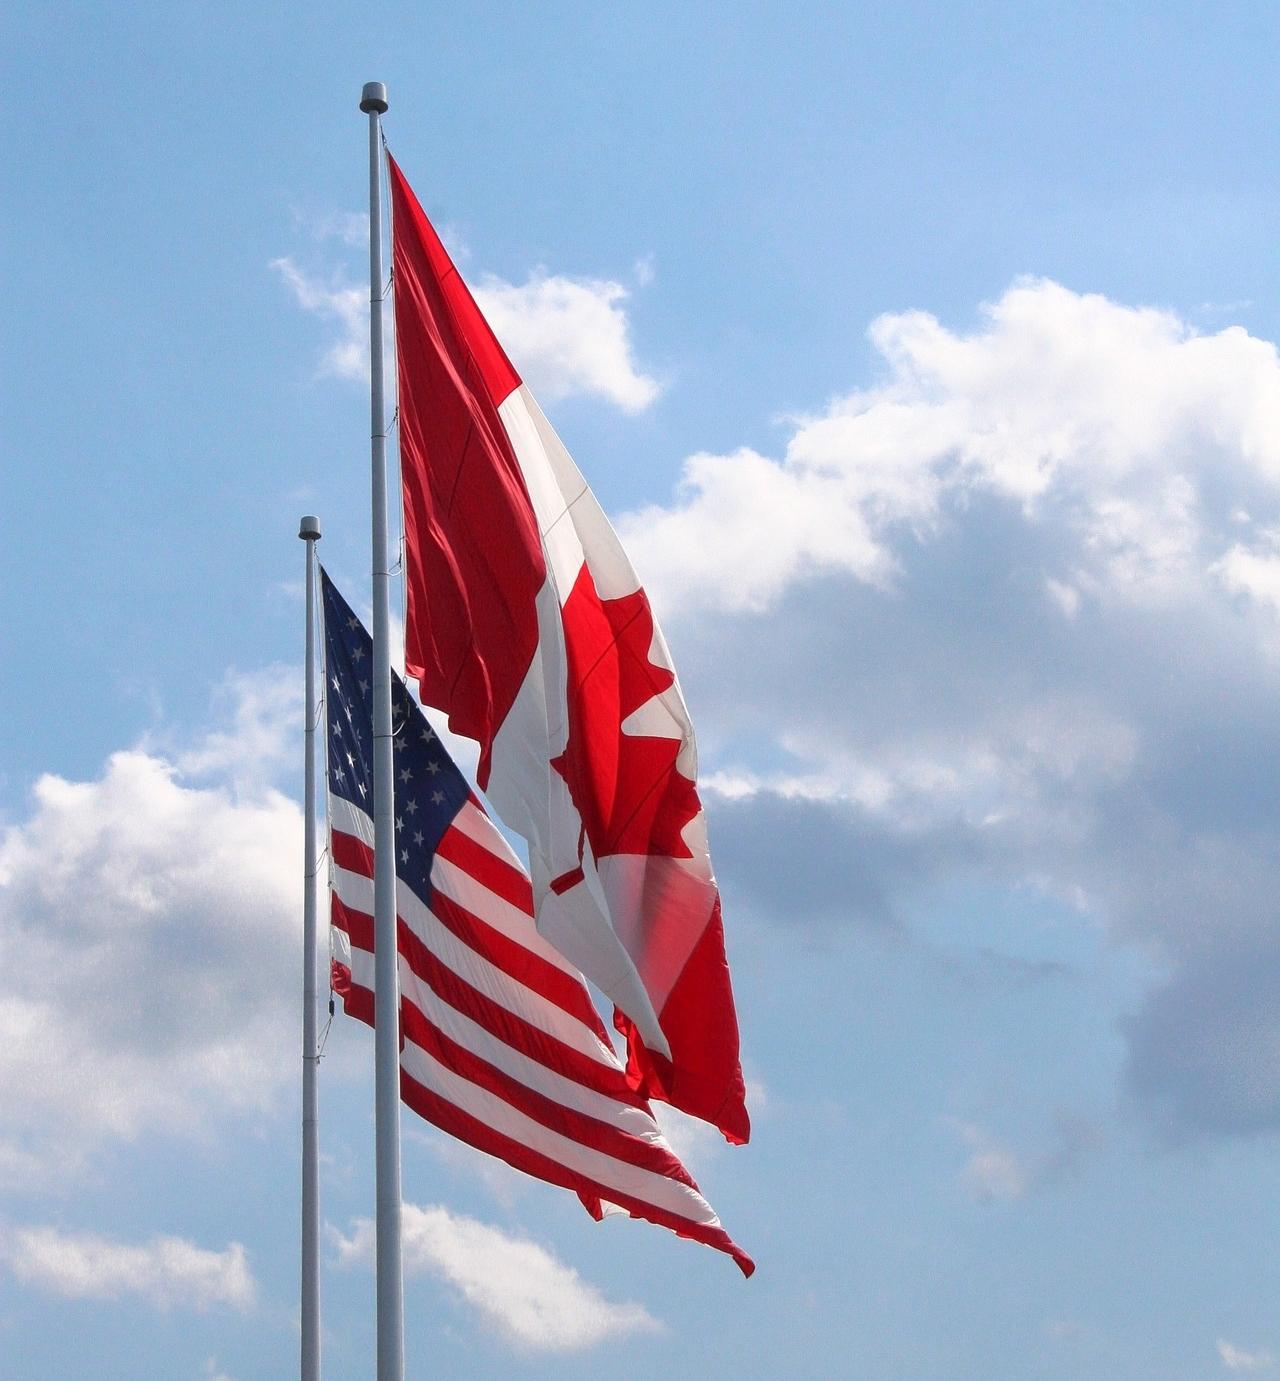 canadian-2711155_1920.jpg